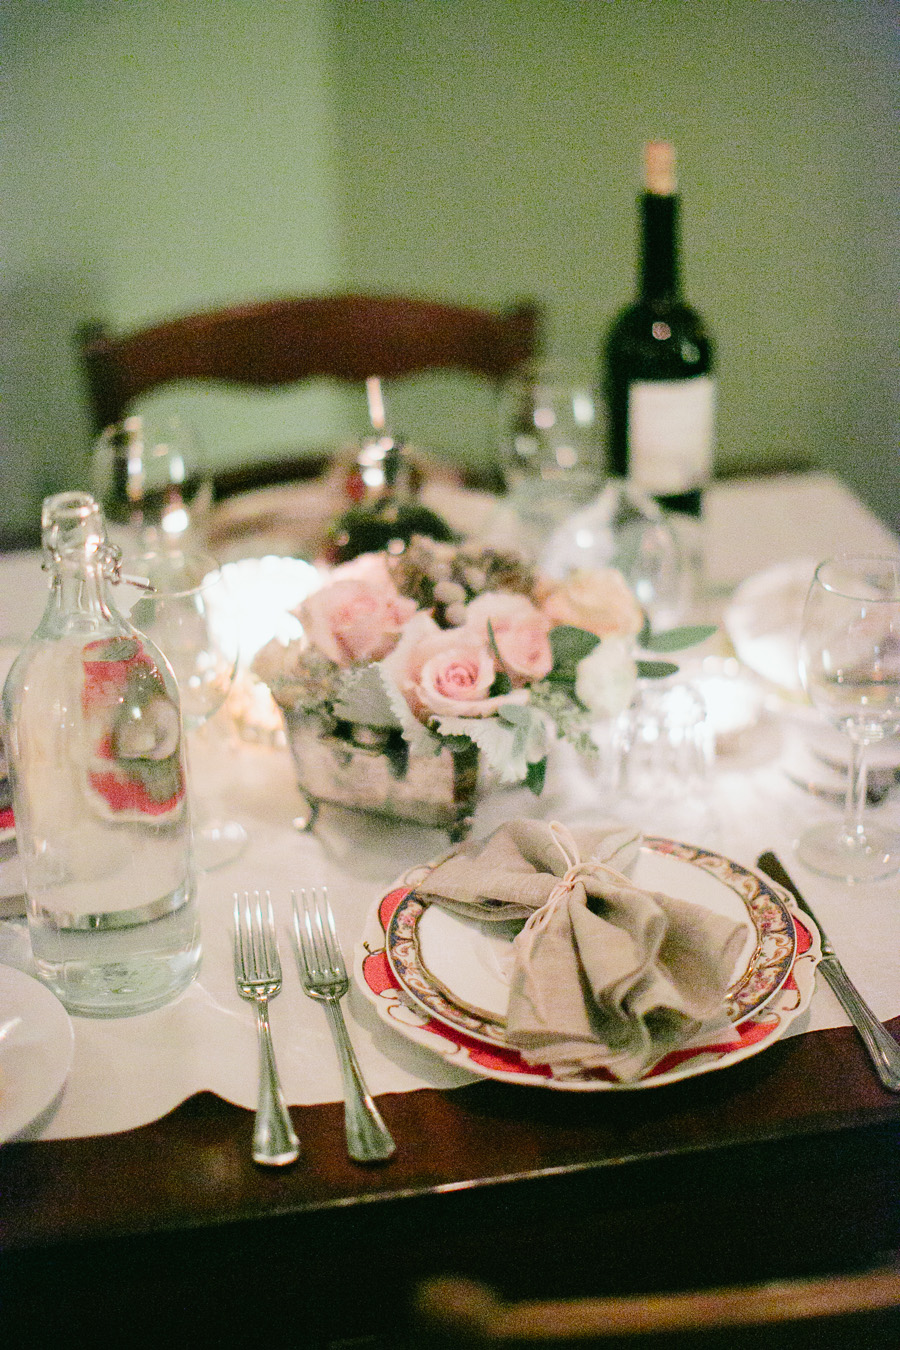 Shabby Chic Wedding Decor 44 Fancy White Tulips at Wedding